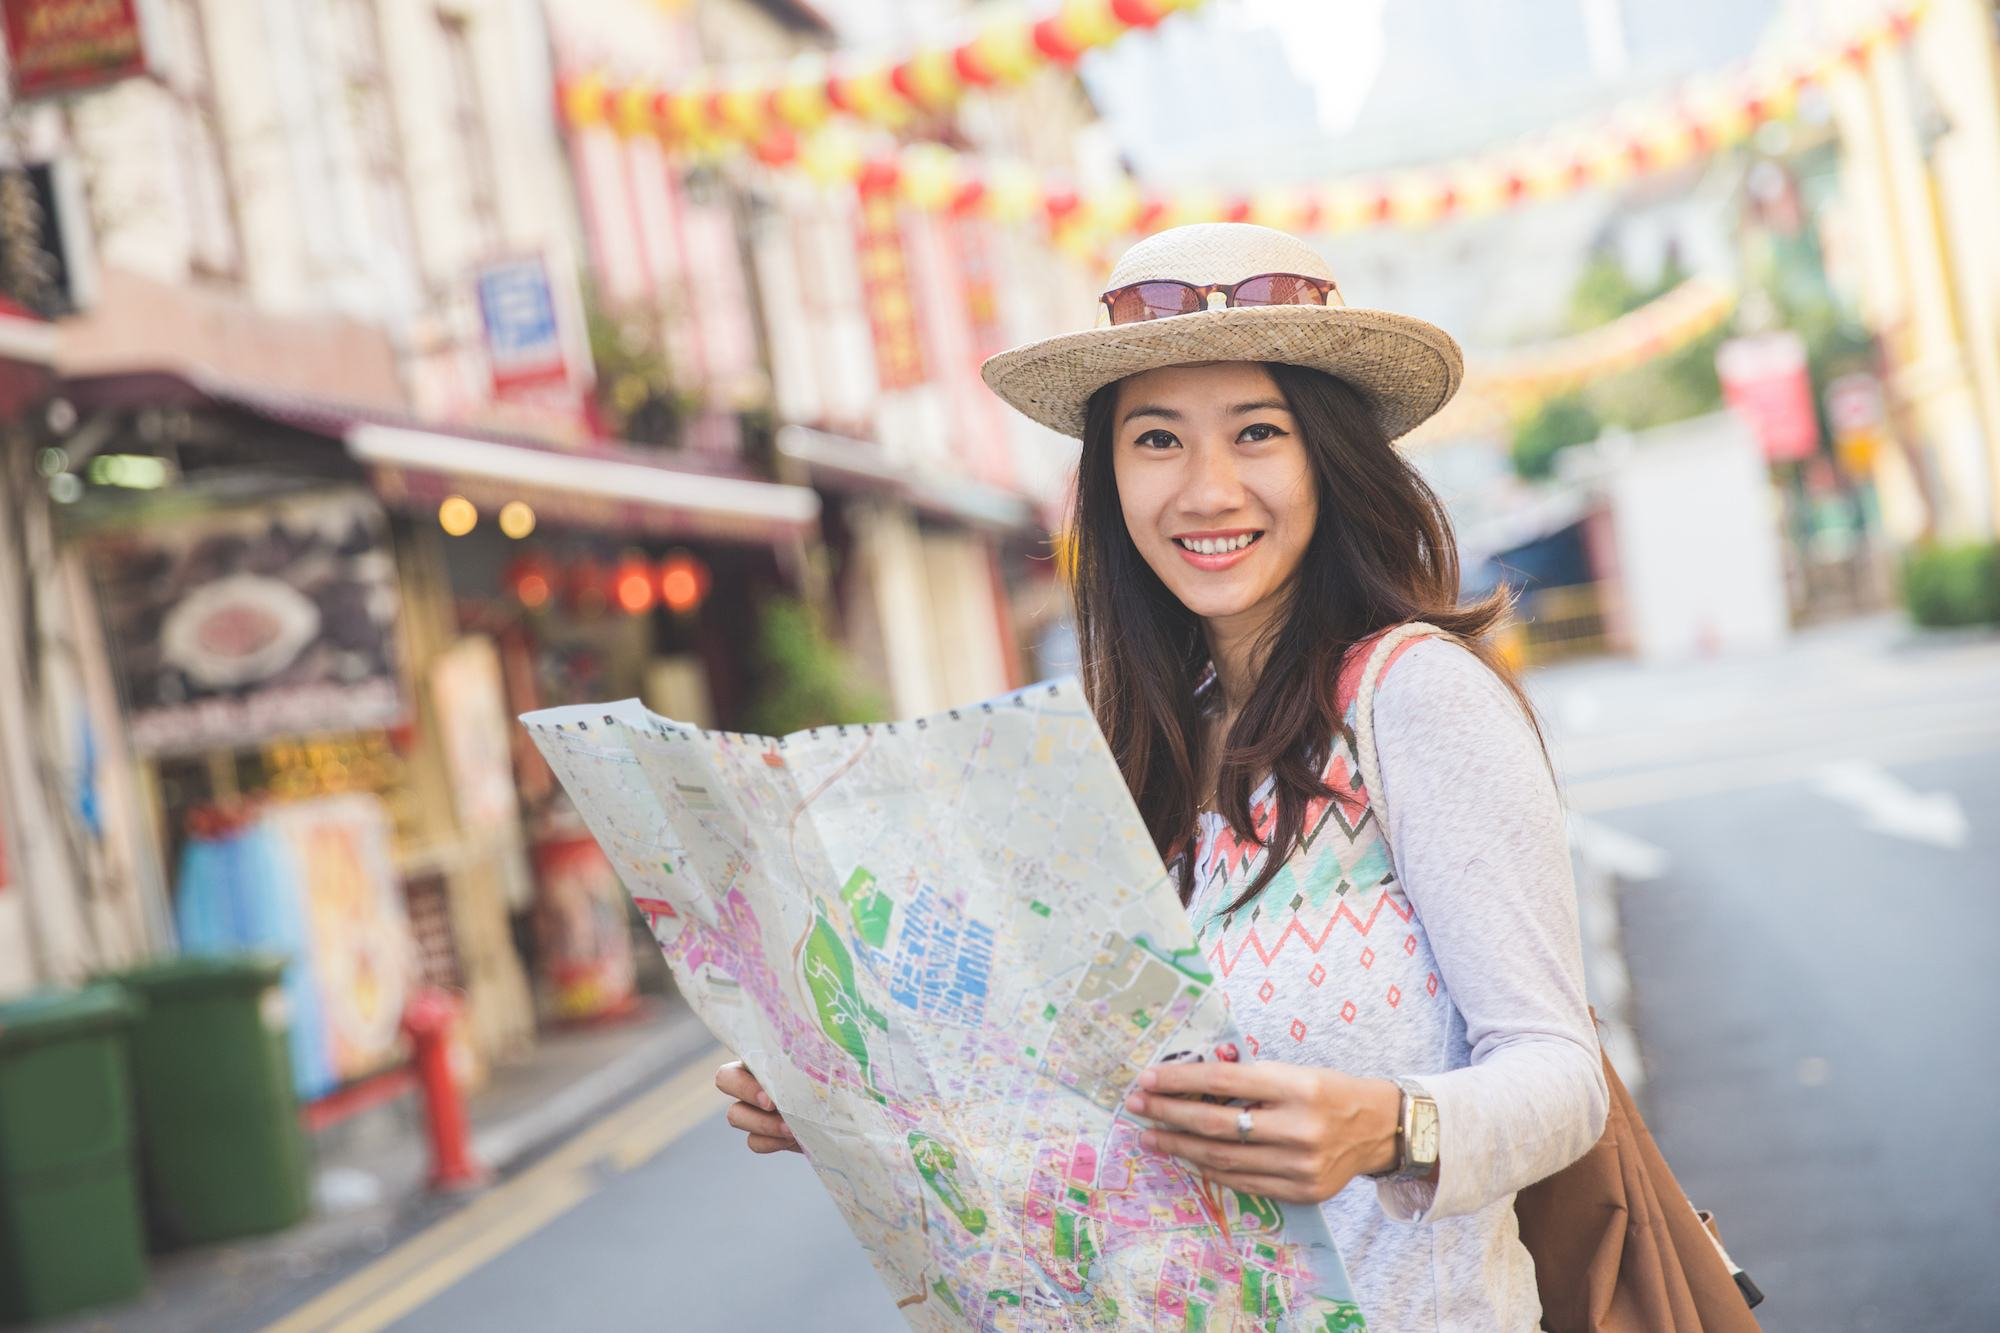 Wanita asia dengan rambut cokelat model rambut layer topi dengan kacamata memegang peta untuk traveling